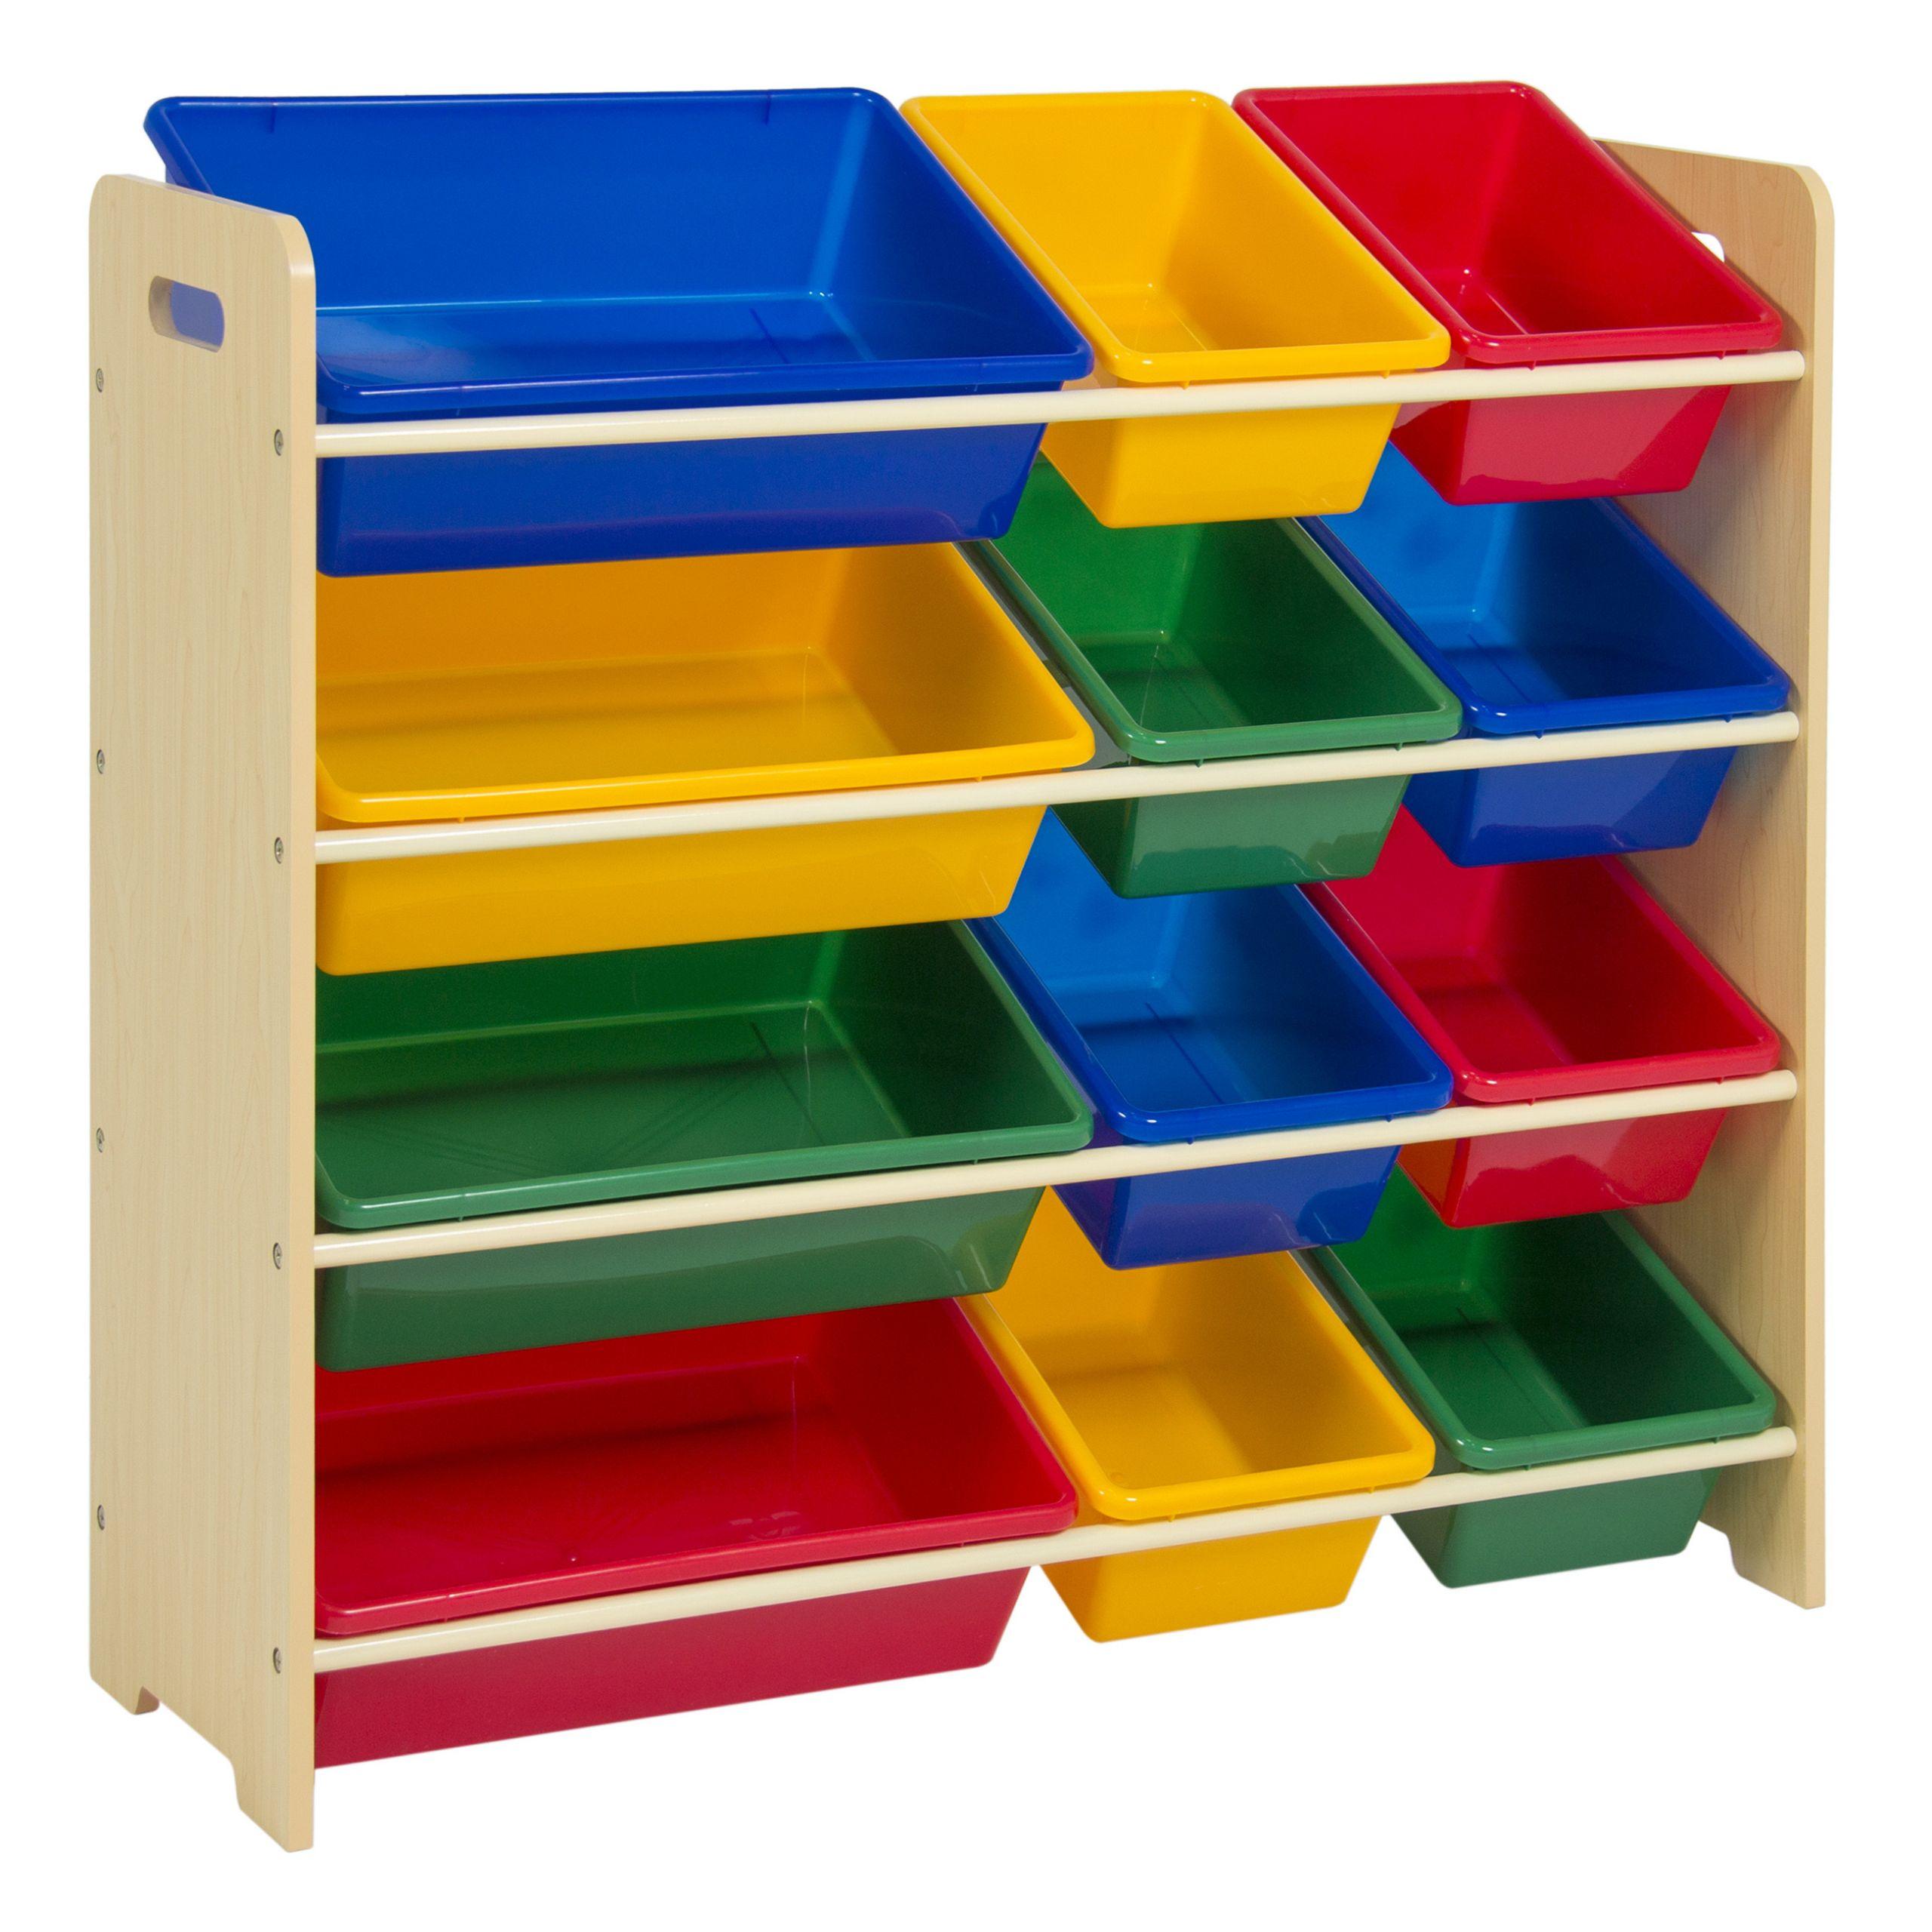 Kids Toys Storage  Toy Bin Organizer Kids Childrens Storage Box Playroom